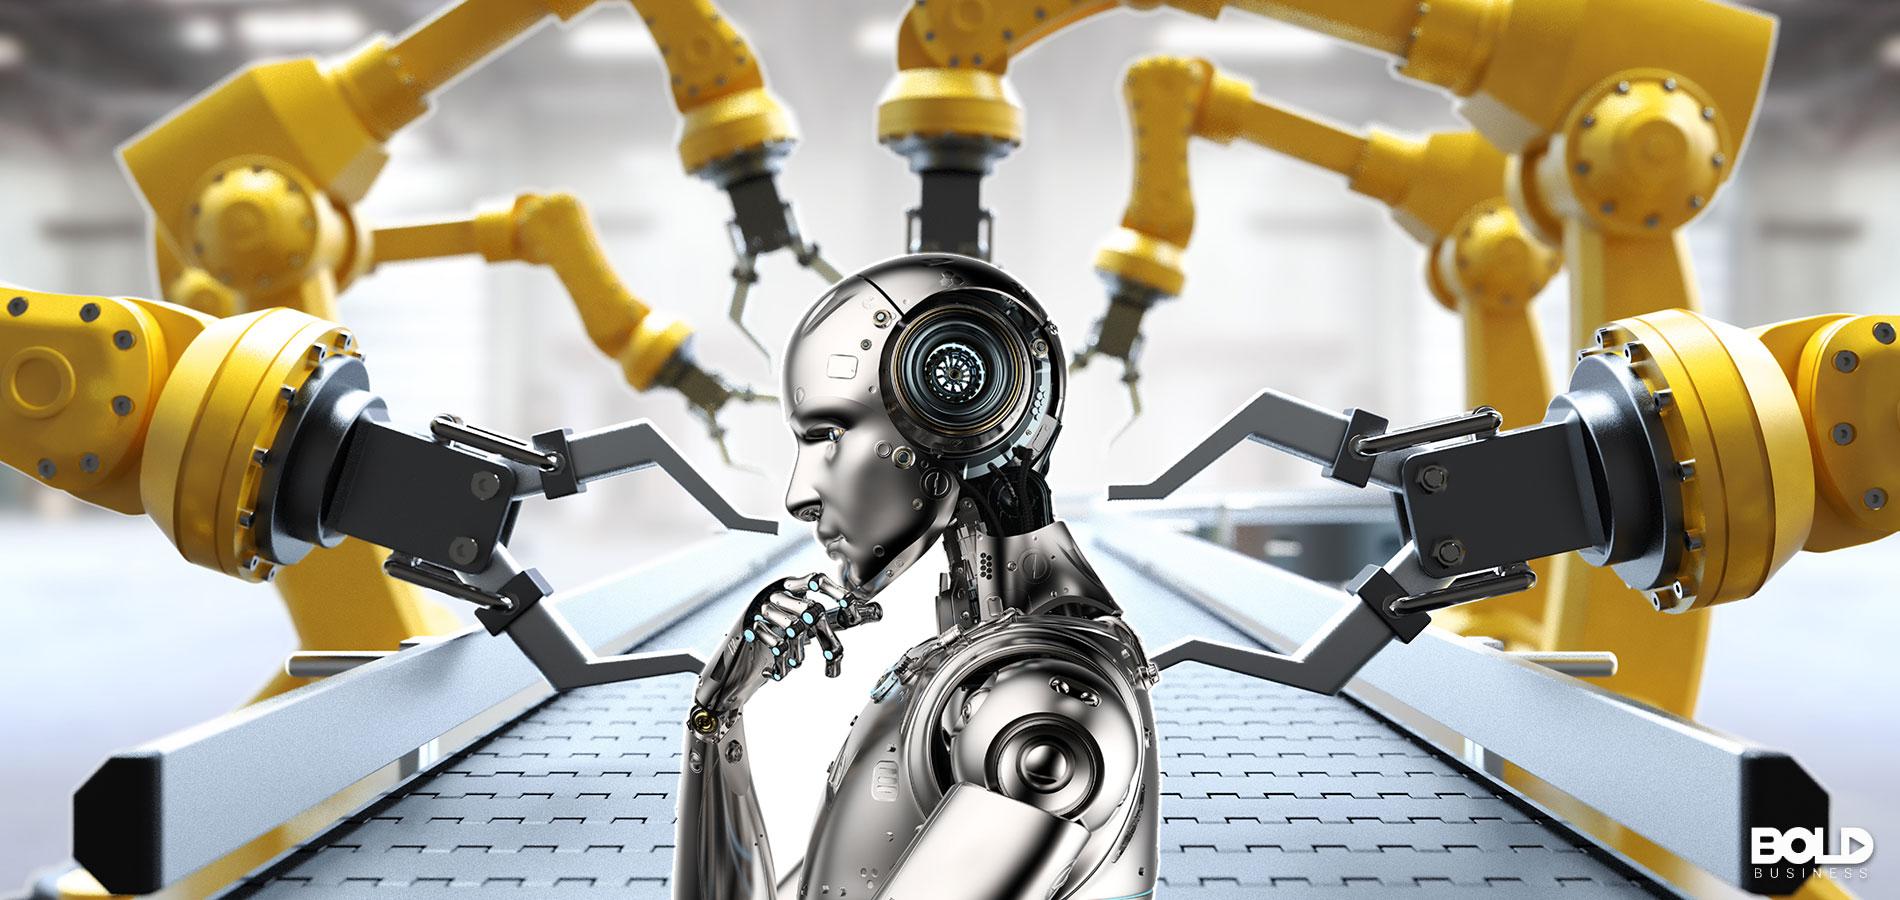 Some robots building a Terminator